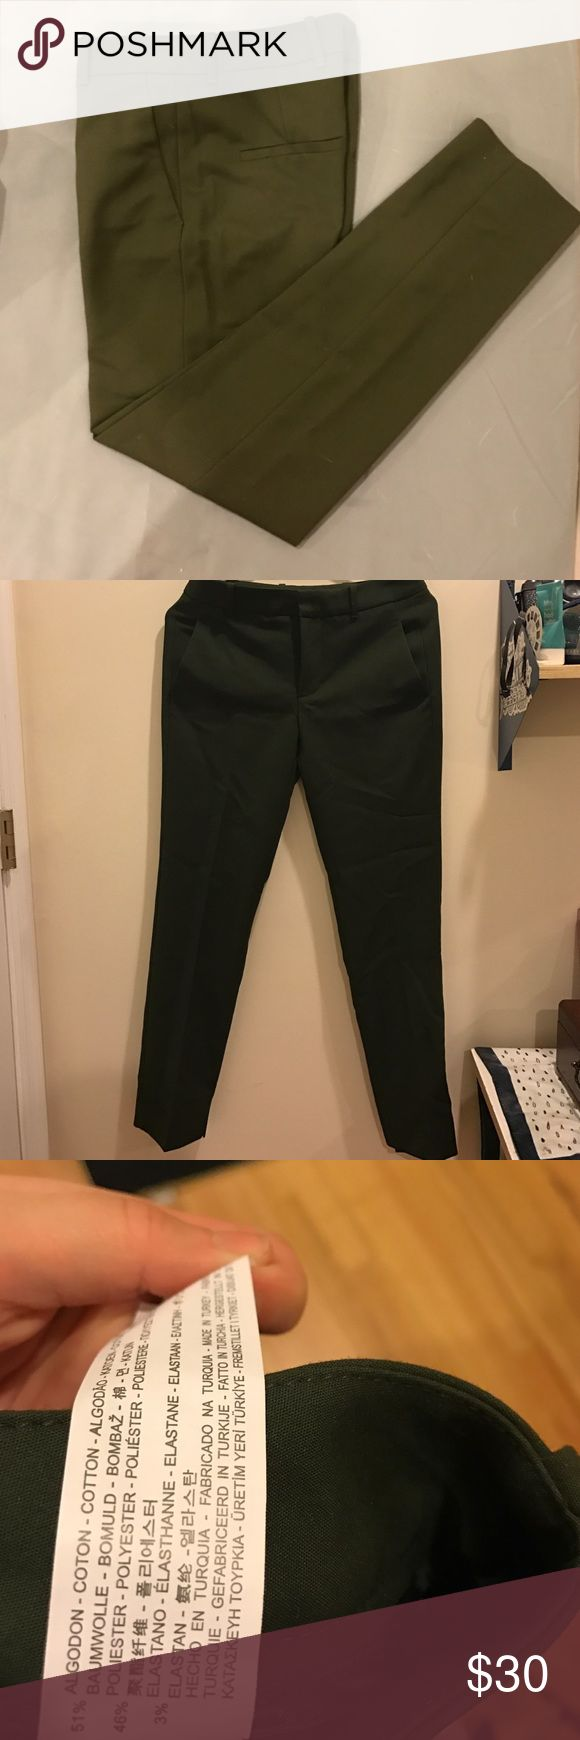 Zara Woman Pants Zara woman straight trousers with pockets/ USA XS; MEX 24 Zara Pants Trousers